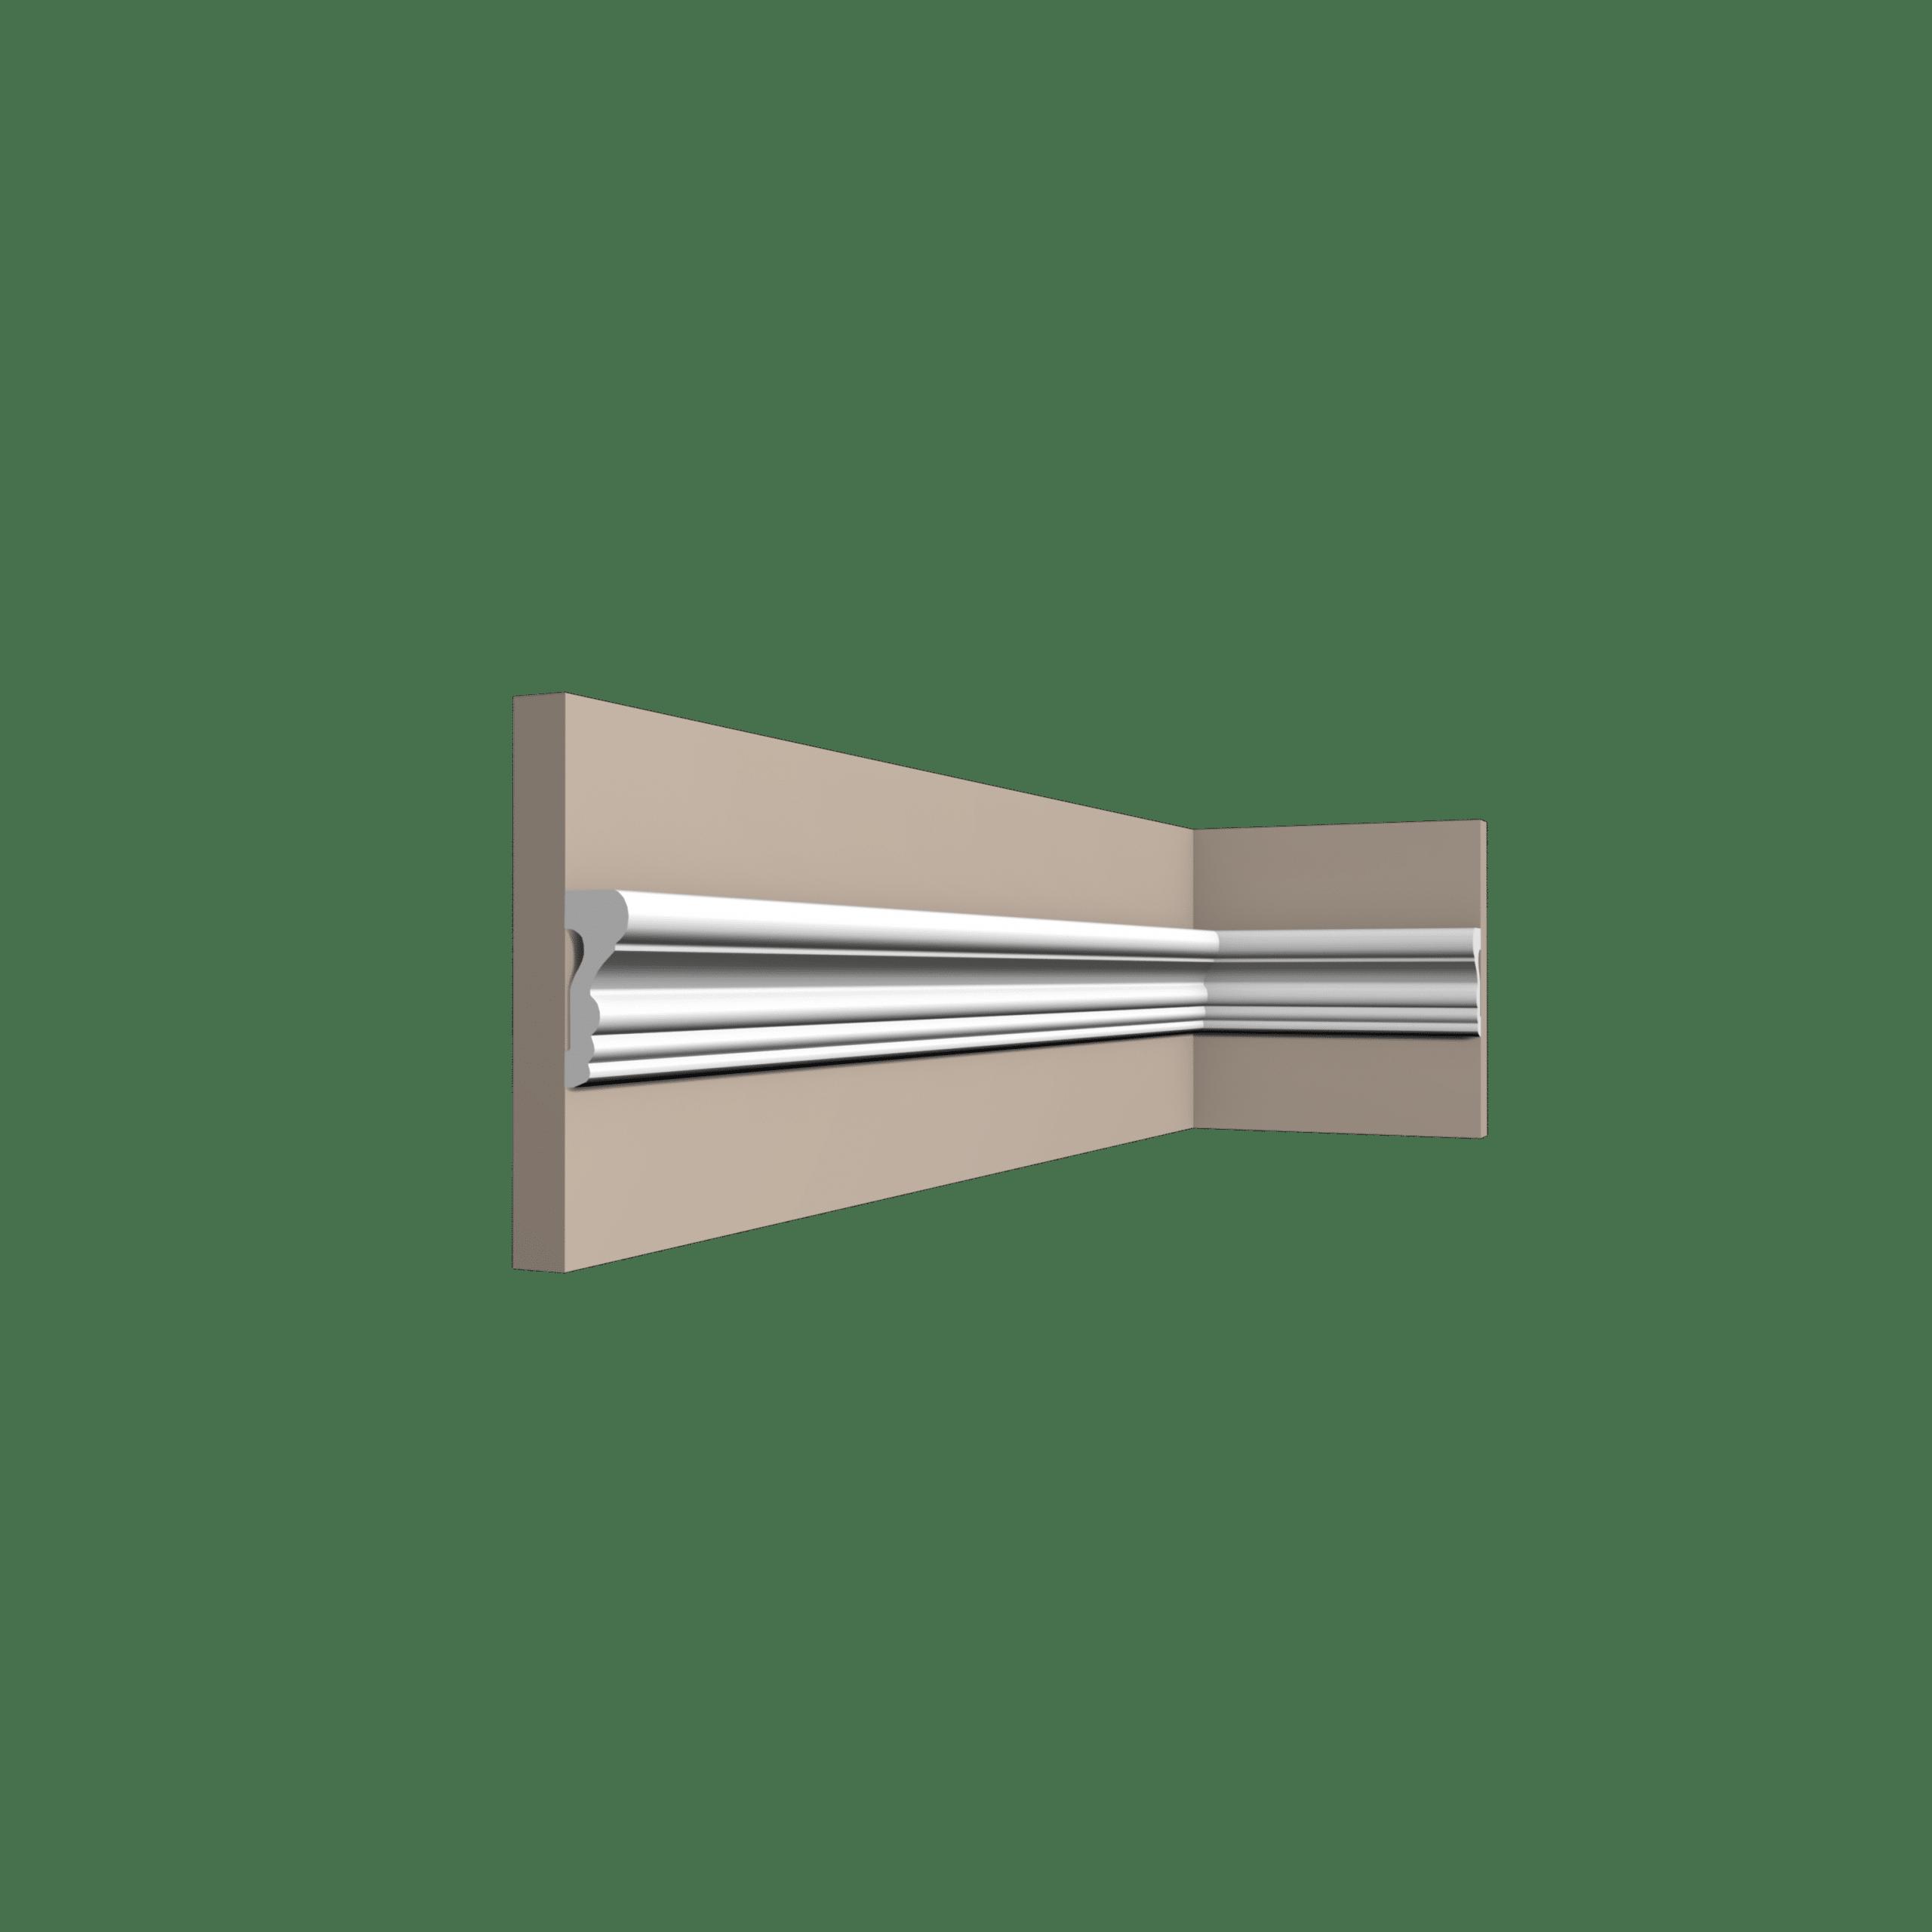 קרניז פוליאוריתן דגם DS - 2620